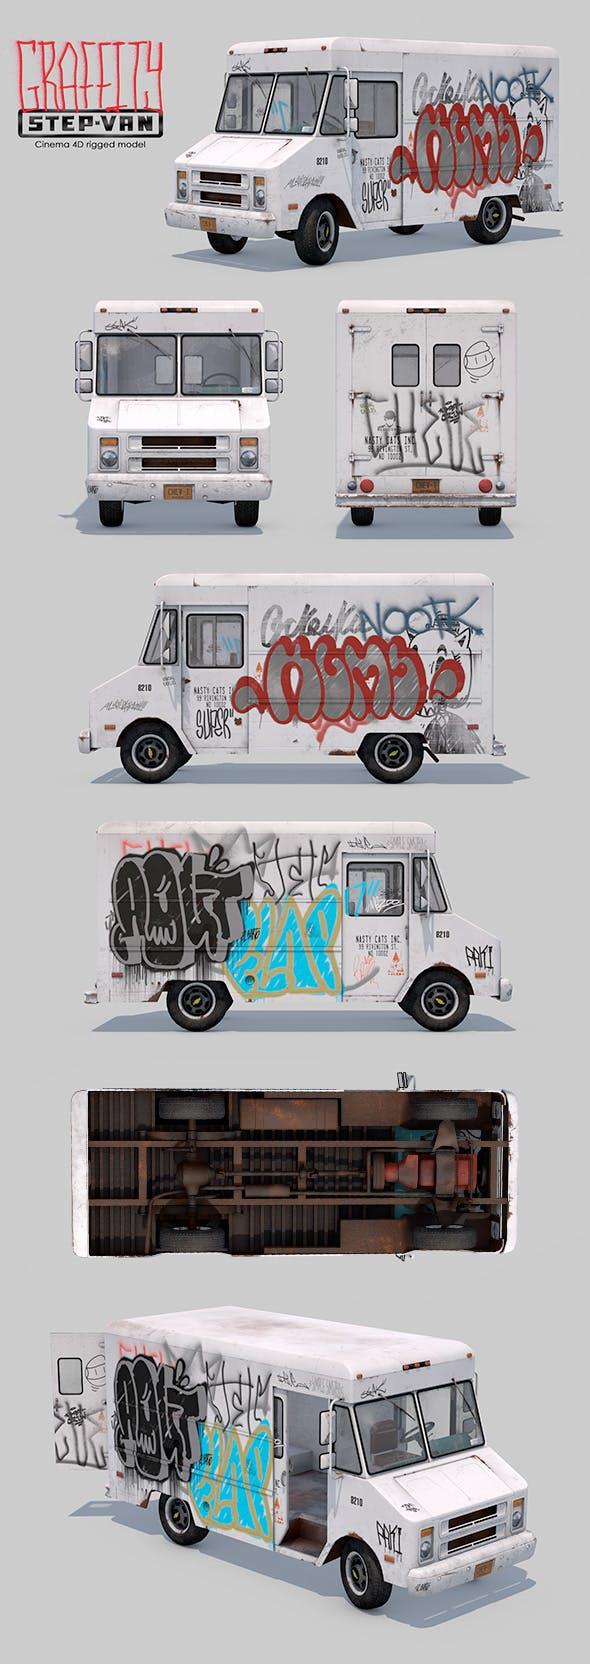 Graffity Step-Van Rigged - 3DOcean Item for Sale